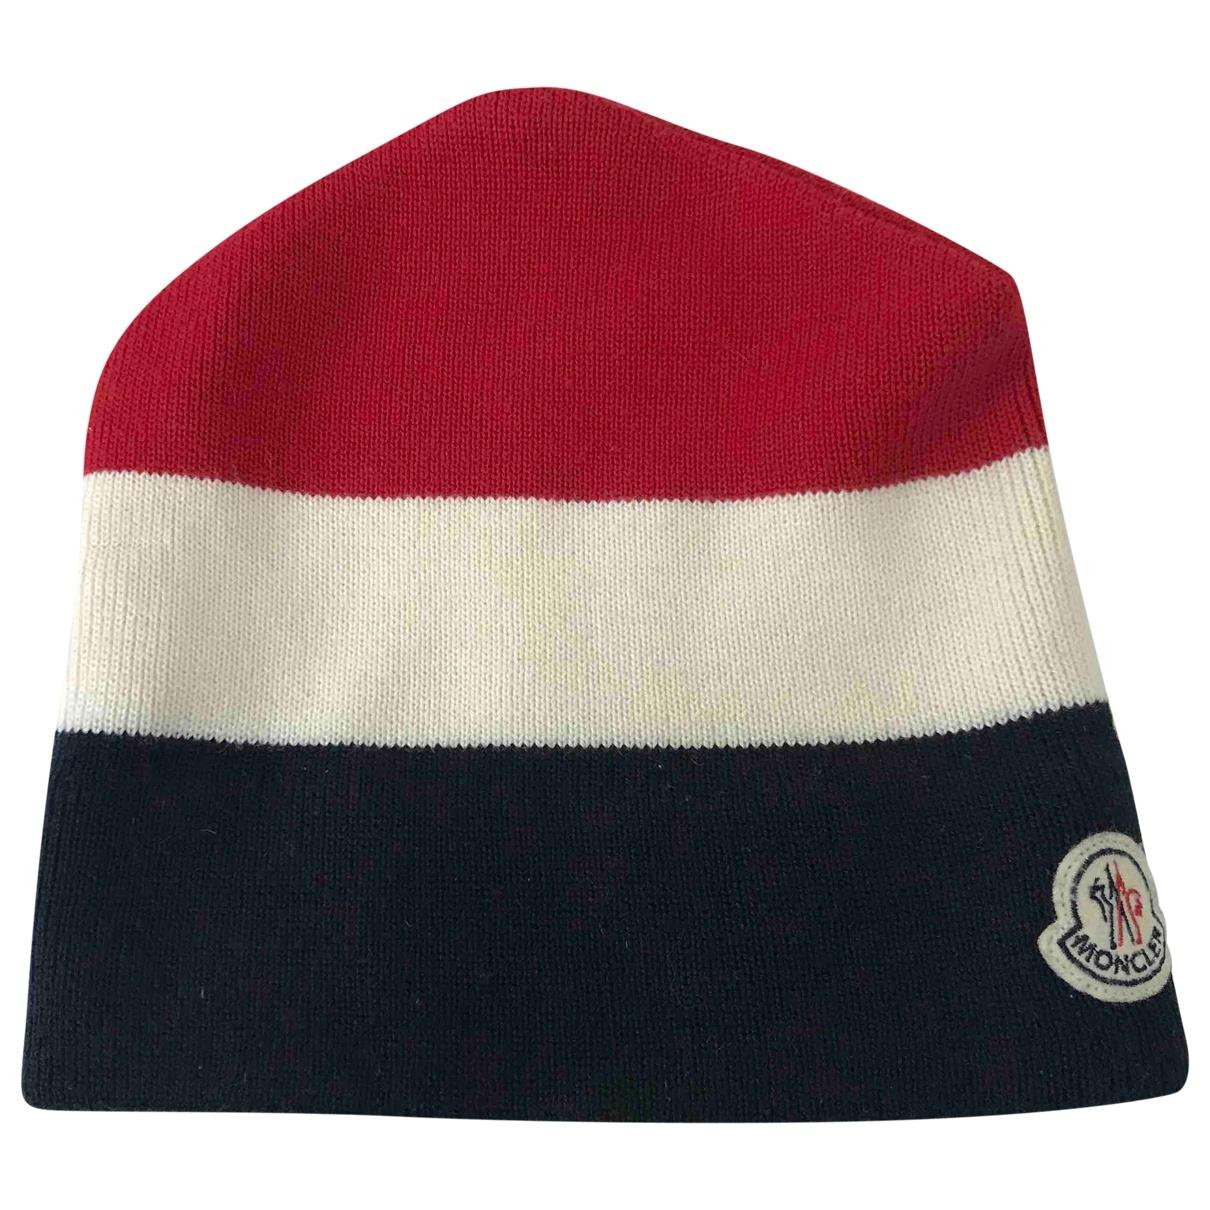 Moncler \N Multicolour Wool hat & pull on hat for Men L International